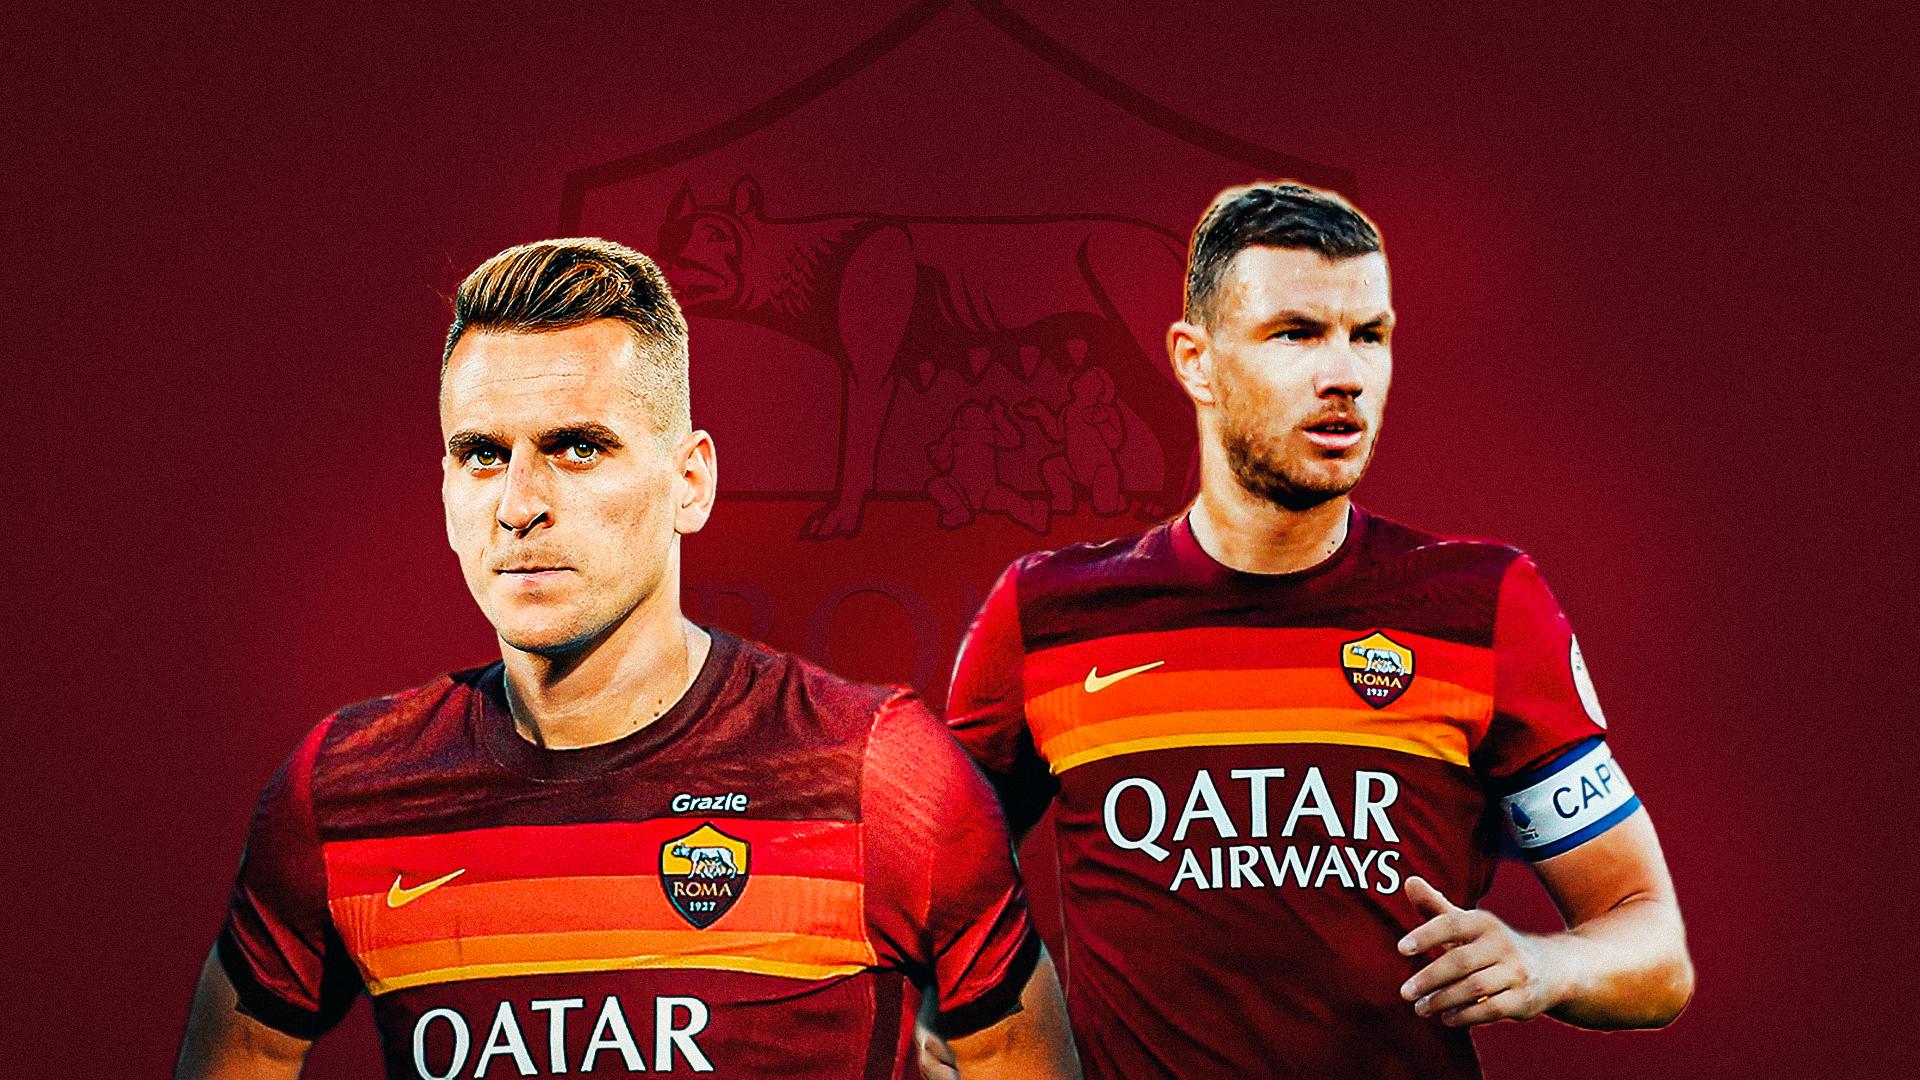 Calciomercato, Milik alla Roma e Dzeko alla Juventus | Le ultime